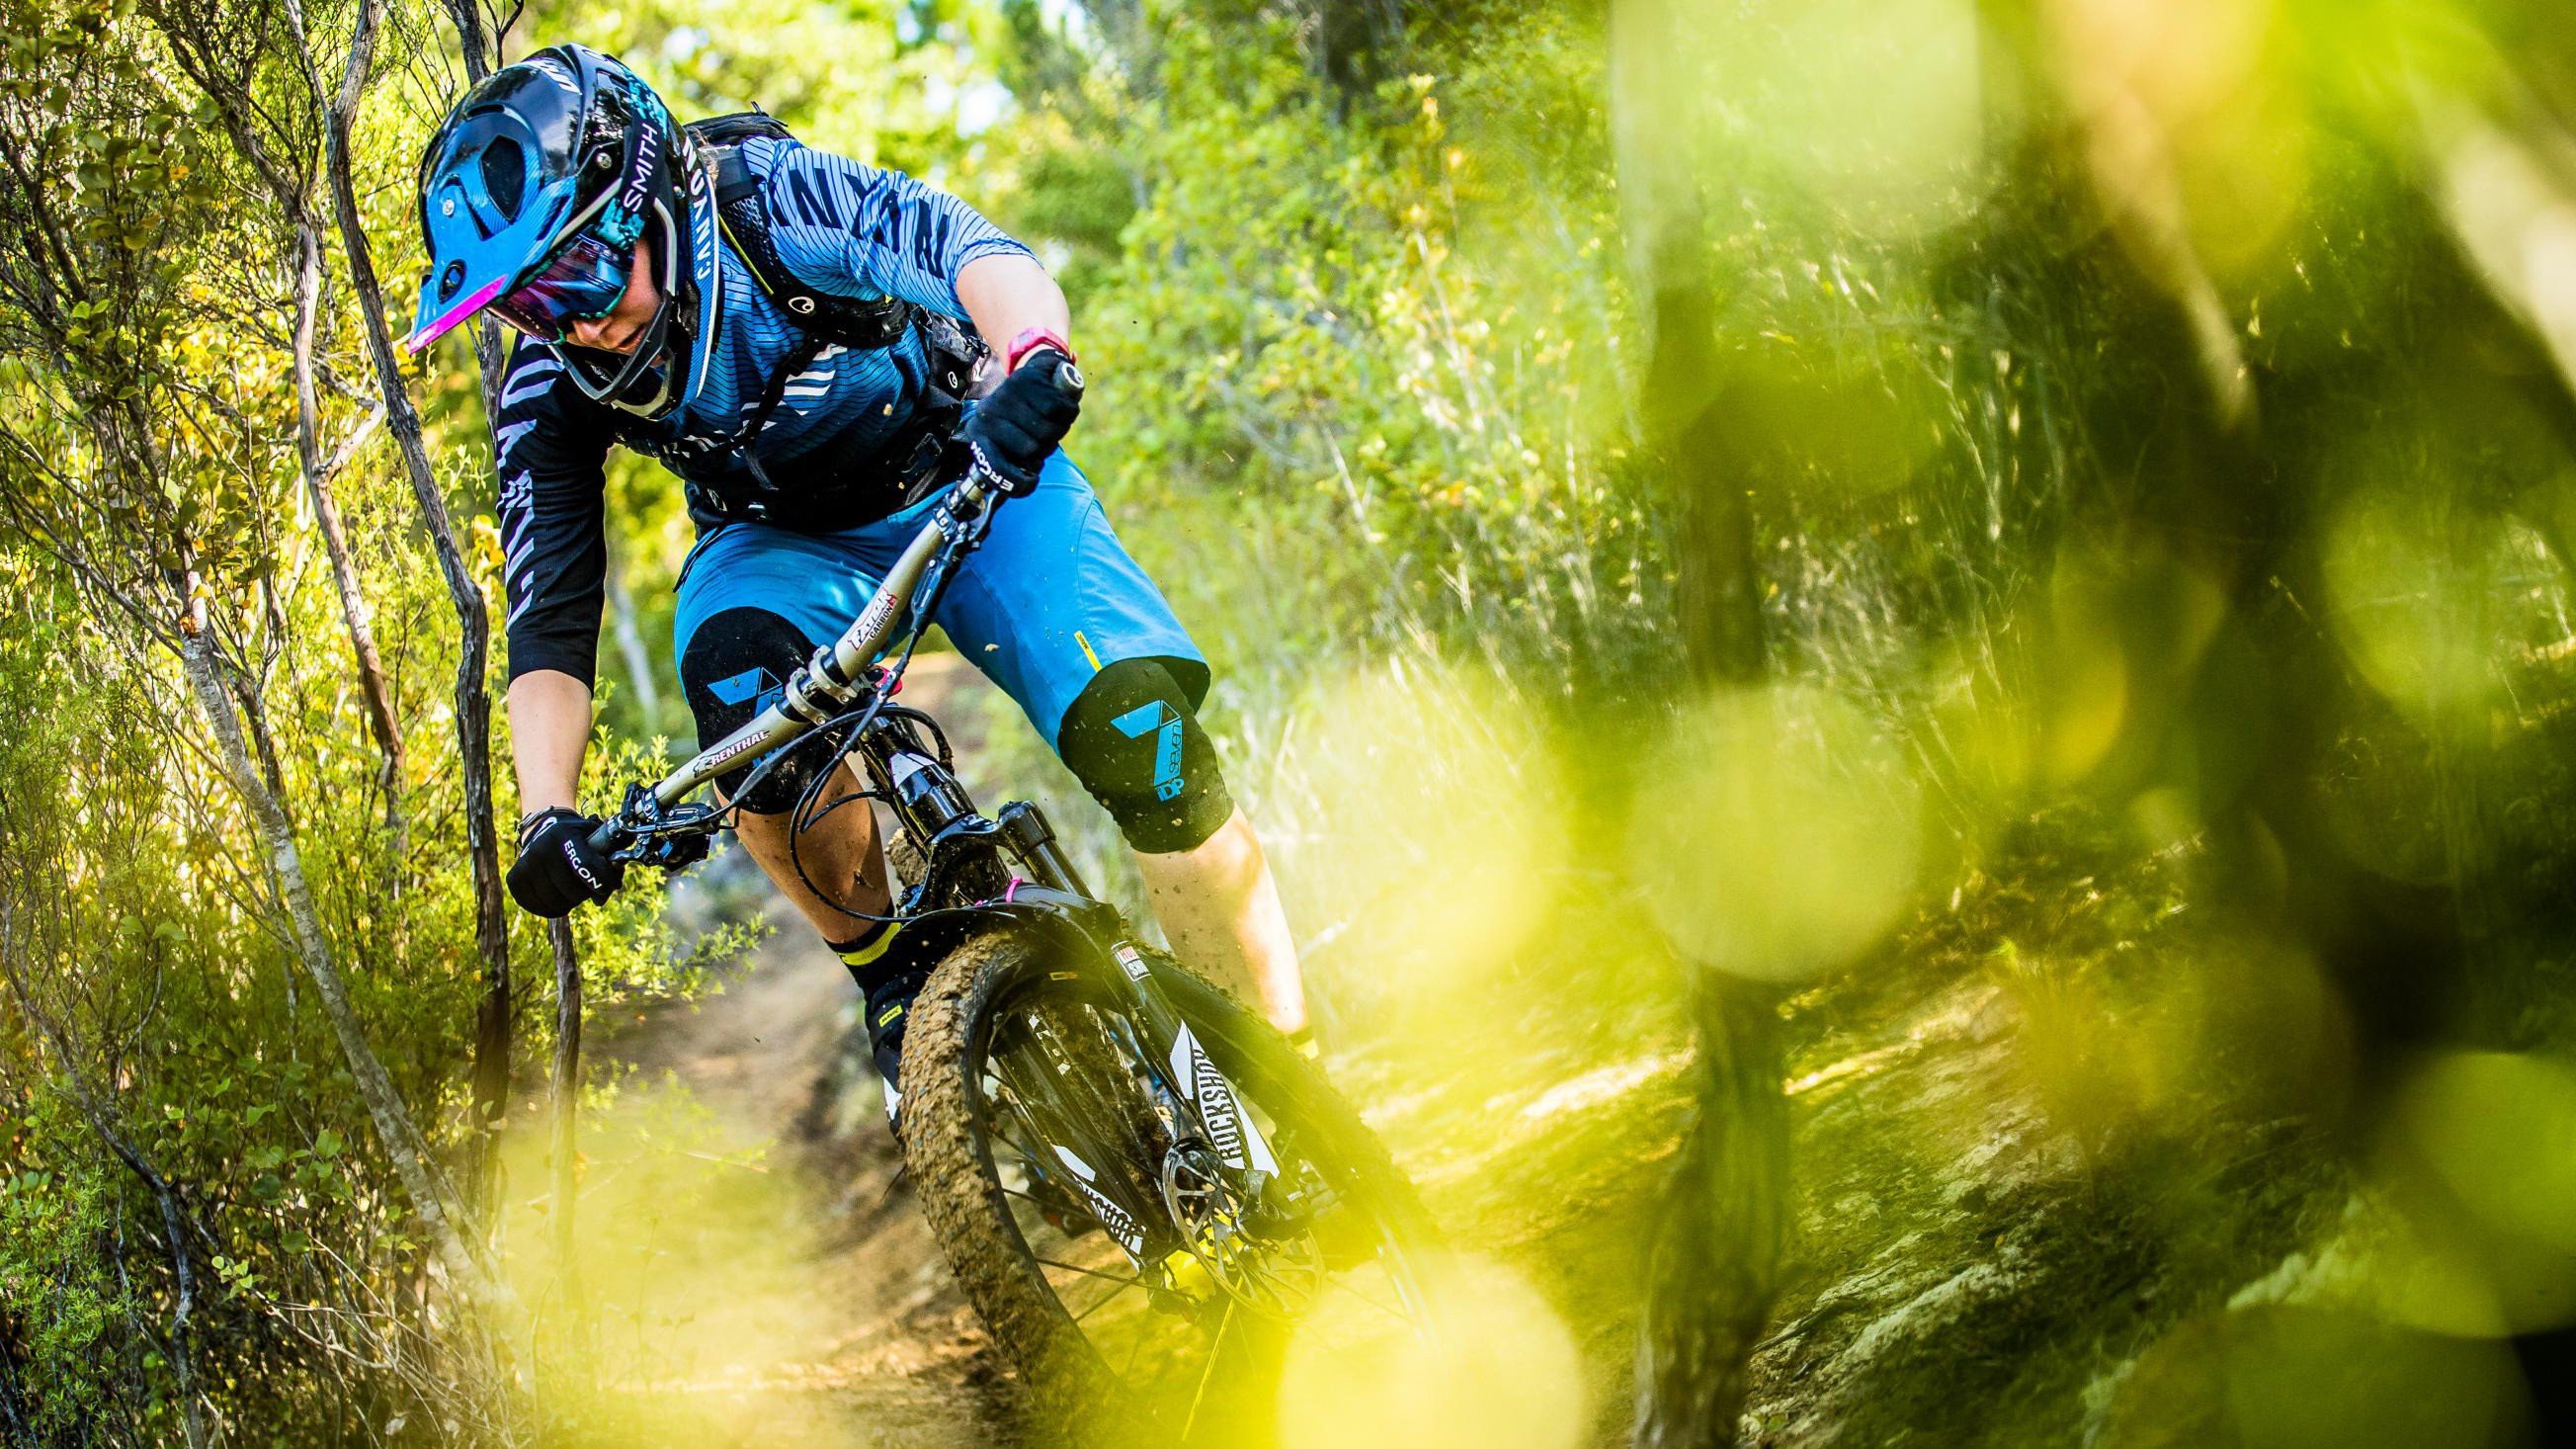 Thoma rides the Canyon Strive CF 9.0 Team bike